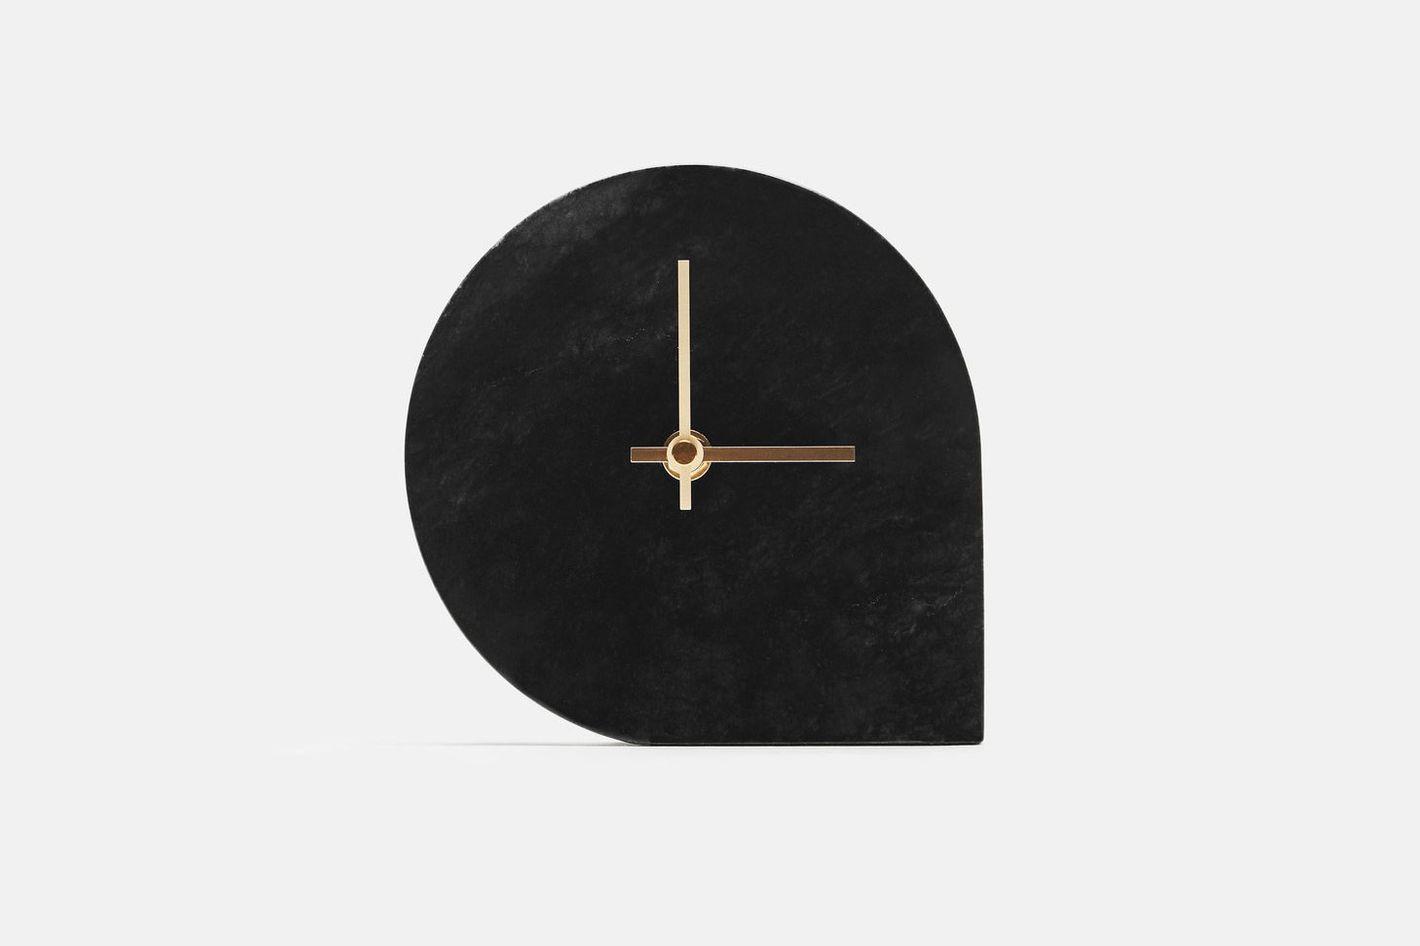 AYTM Marble Table Clock